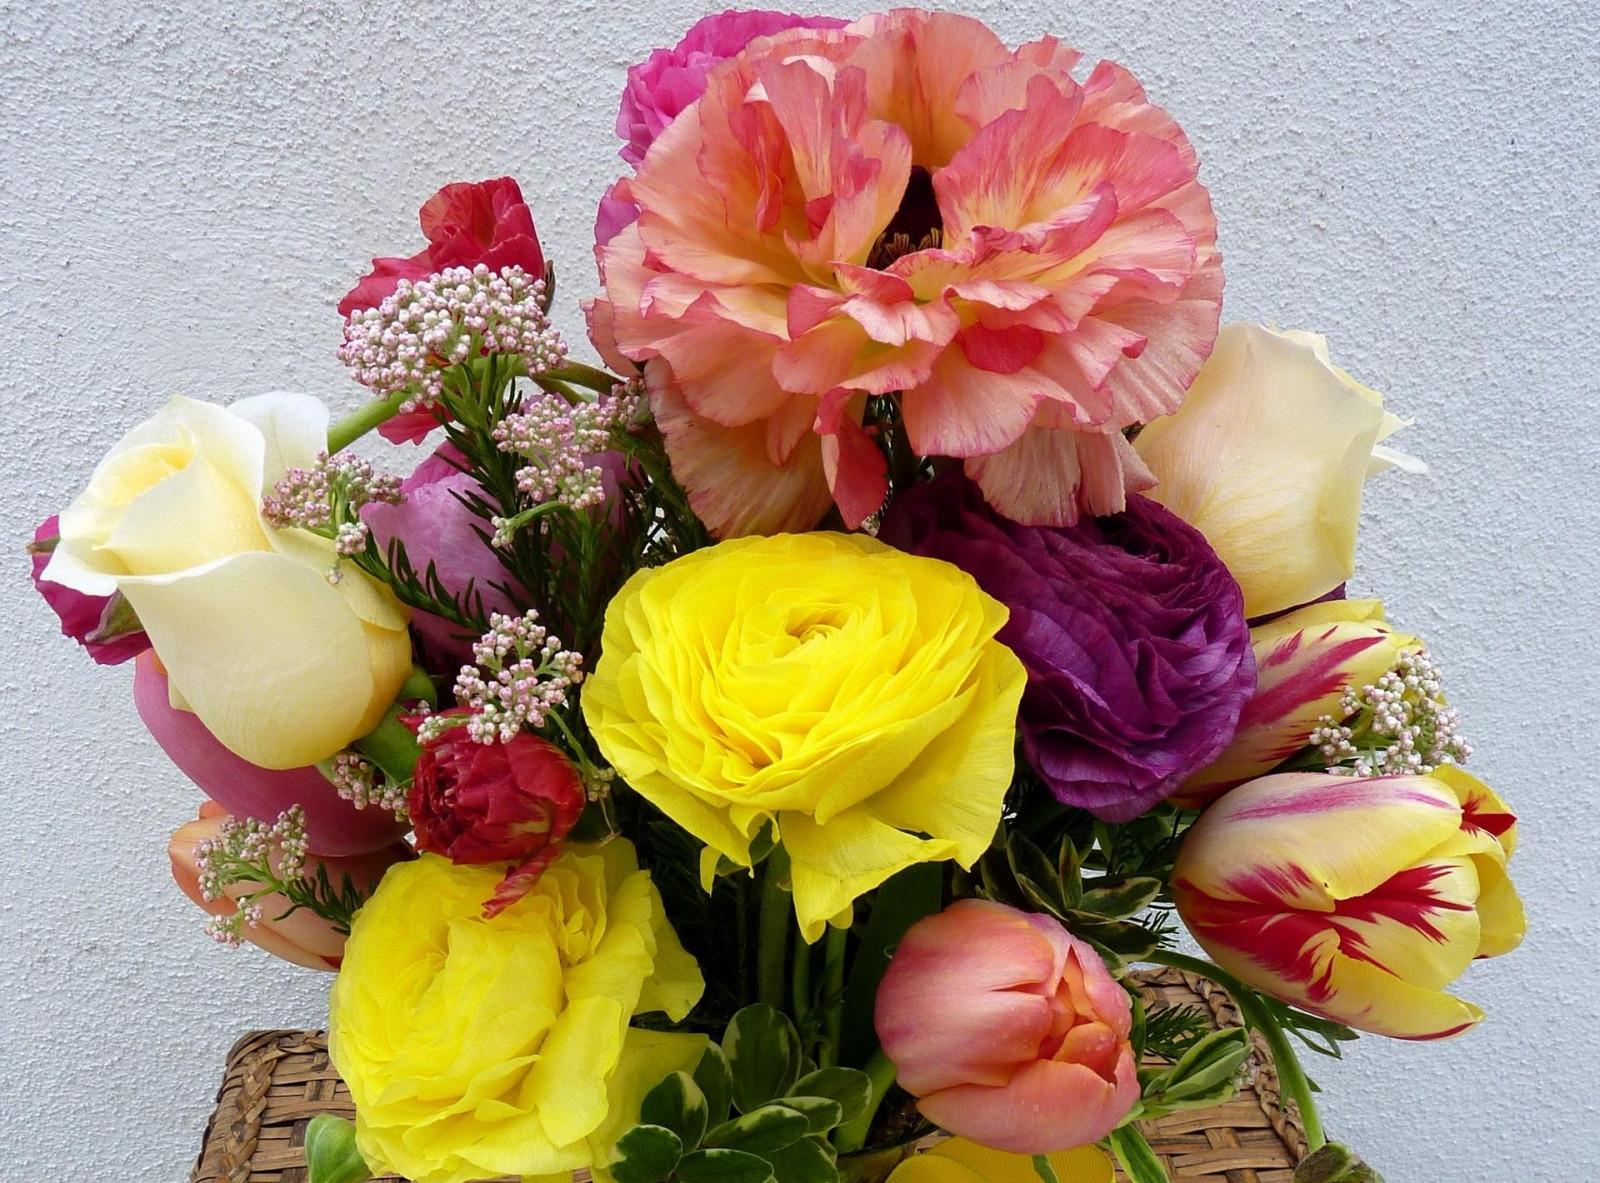 Цветы картинки роза тюльпаны